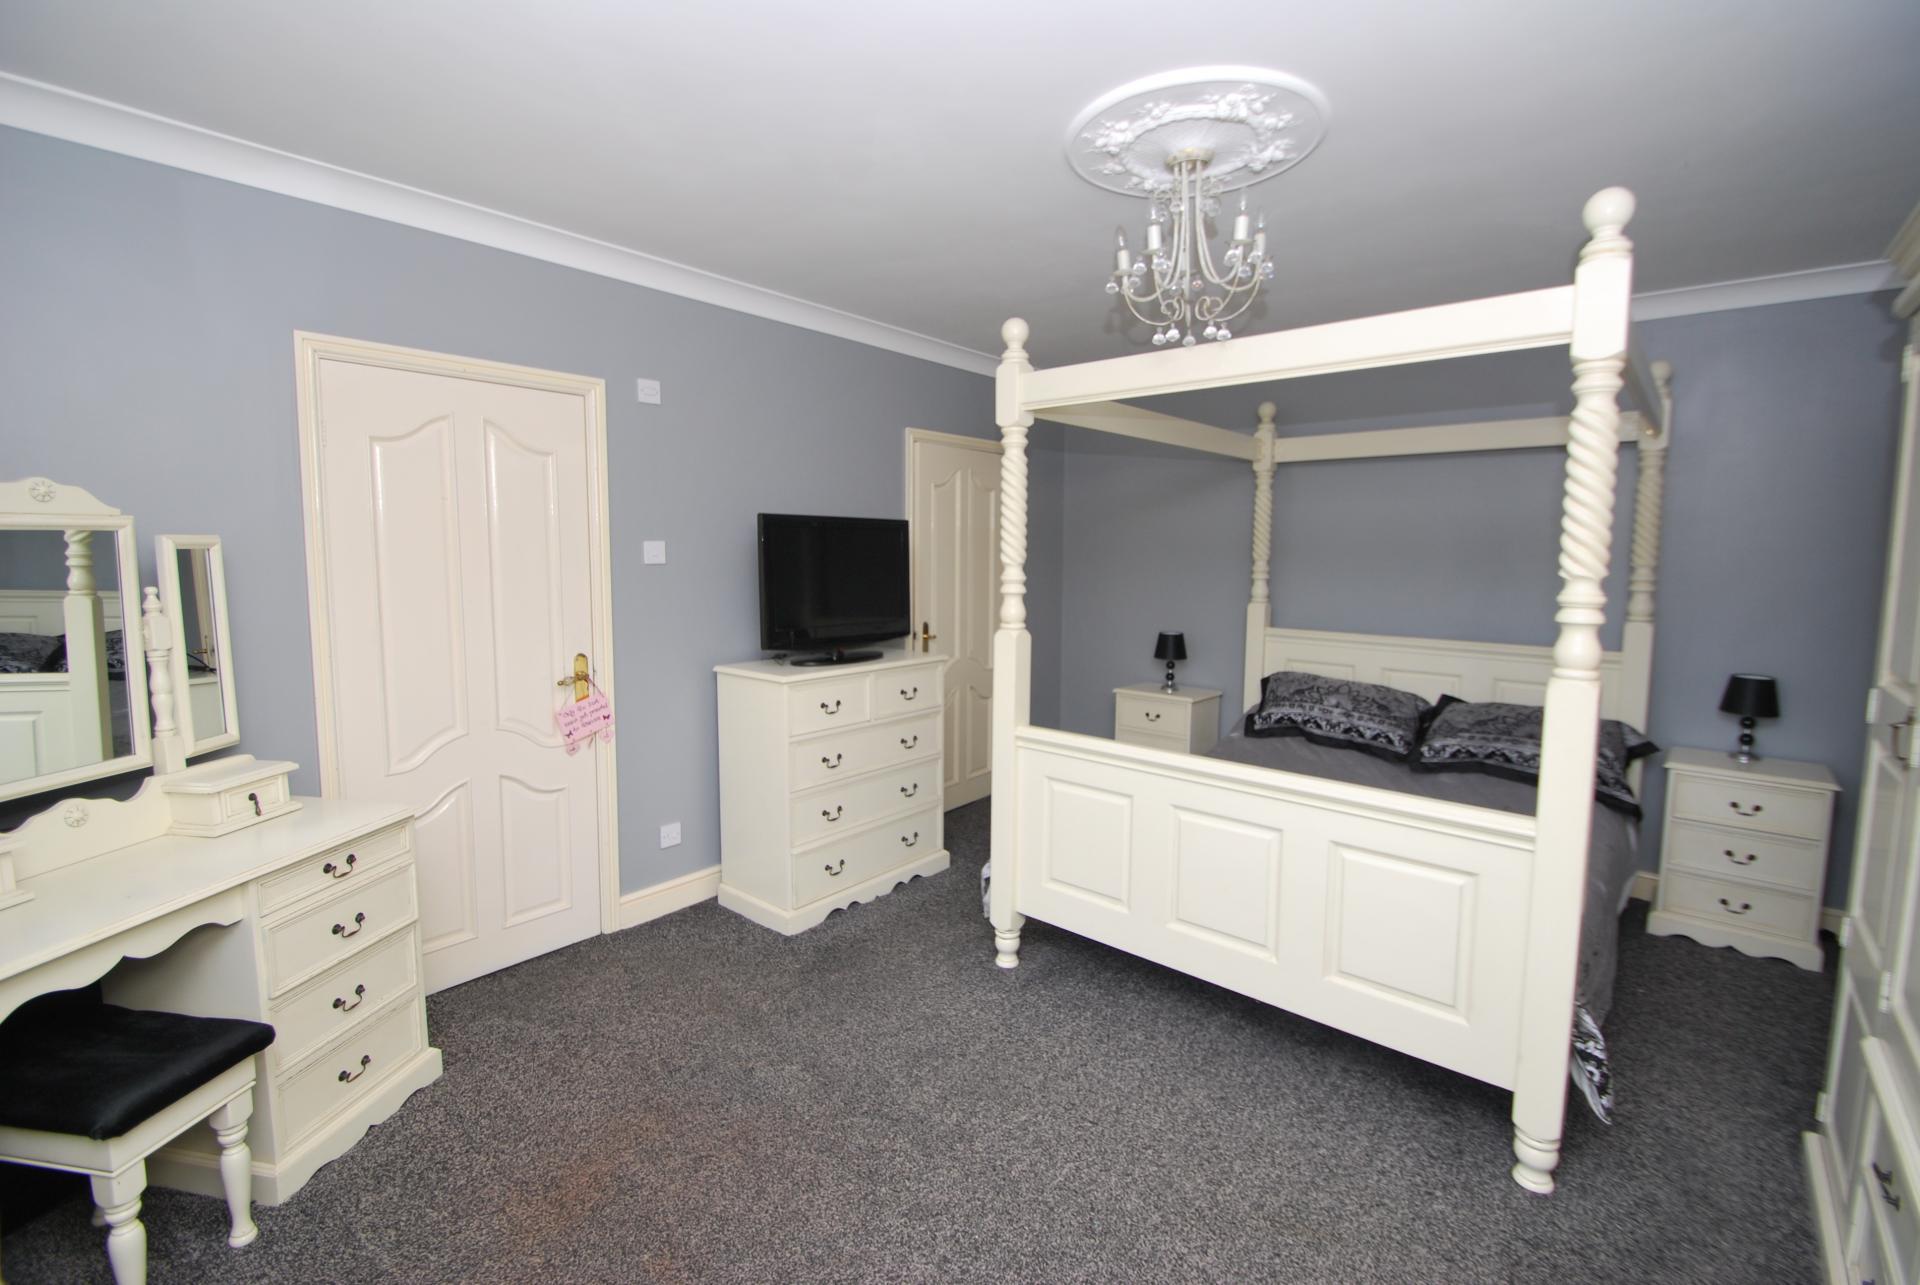 Bedroom detached for sale in barnsley